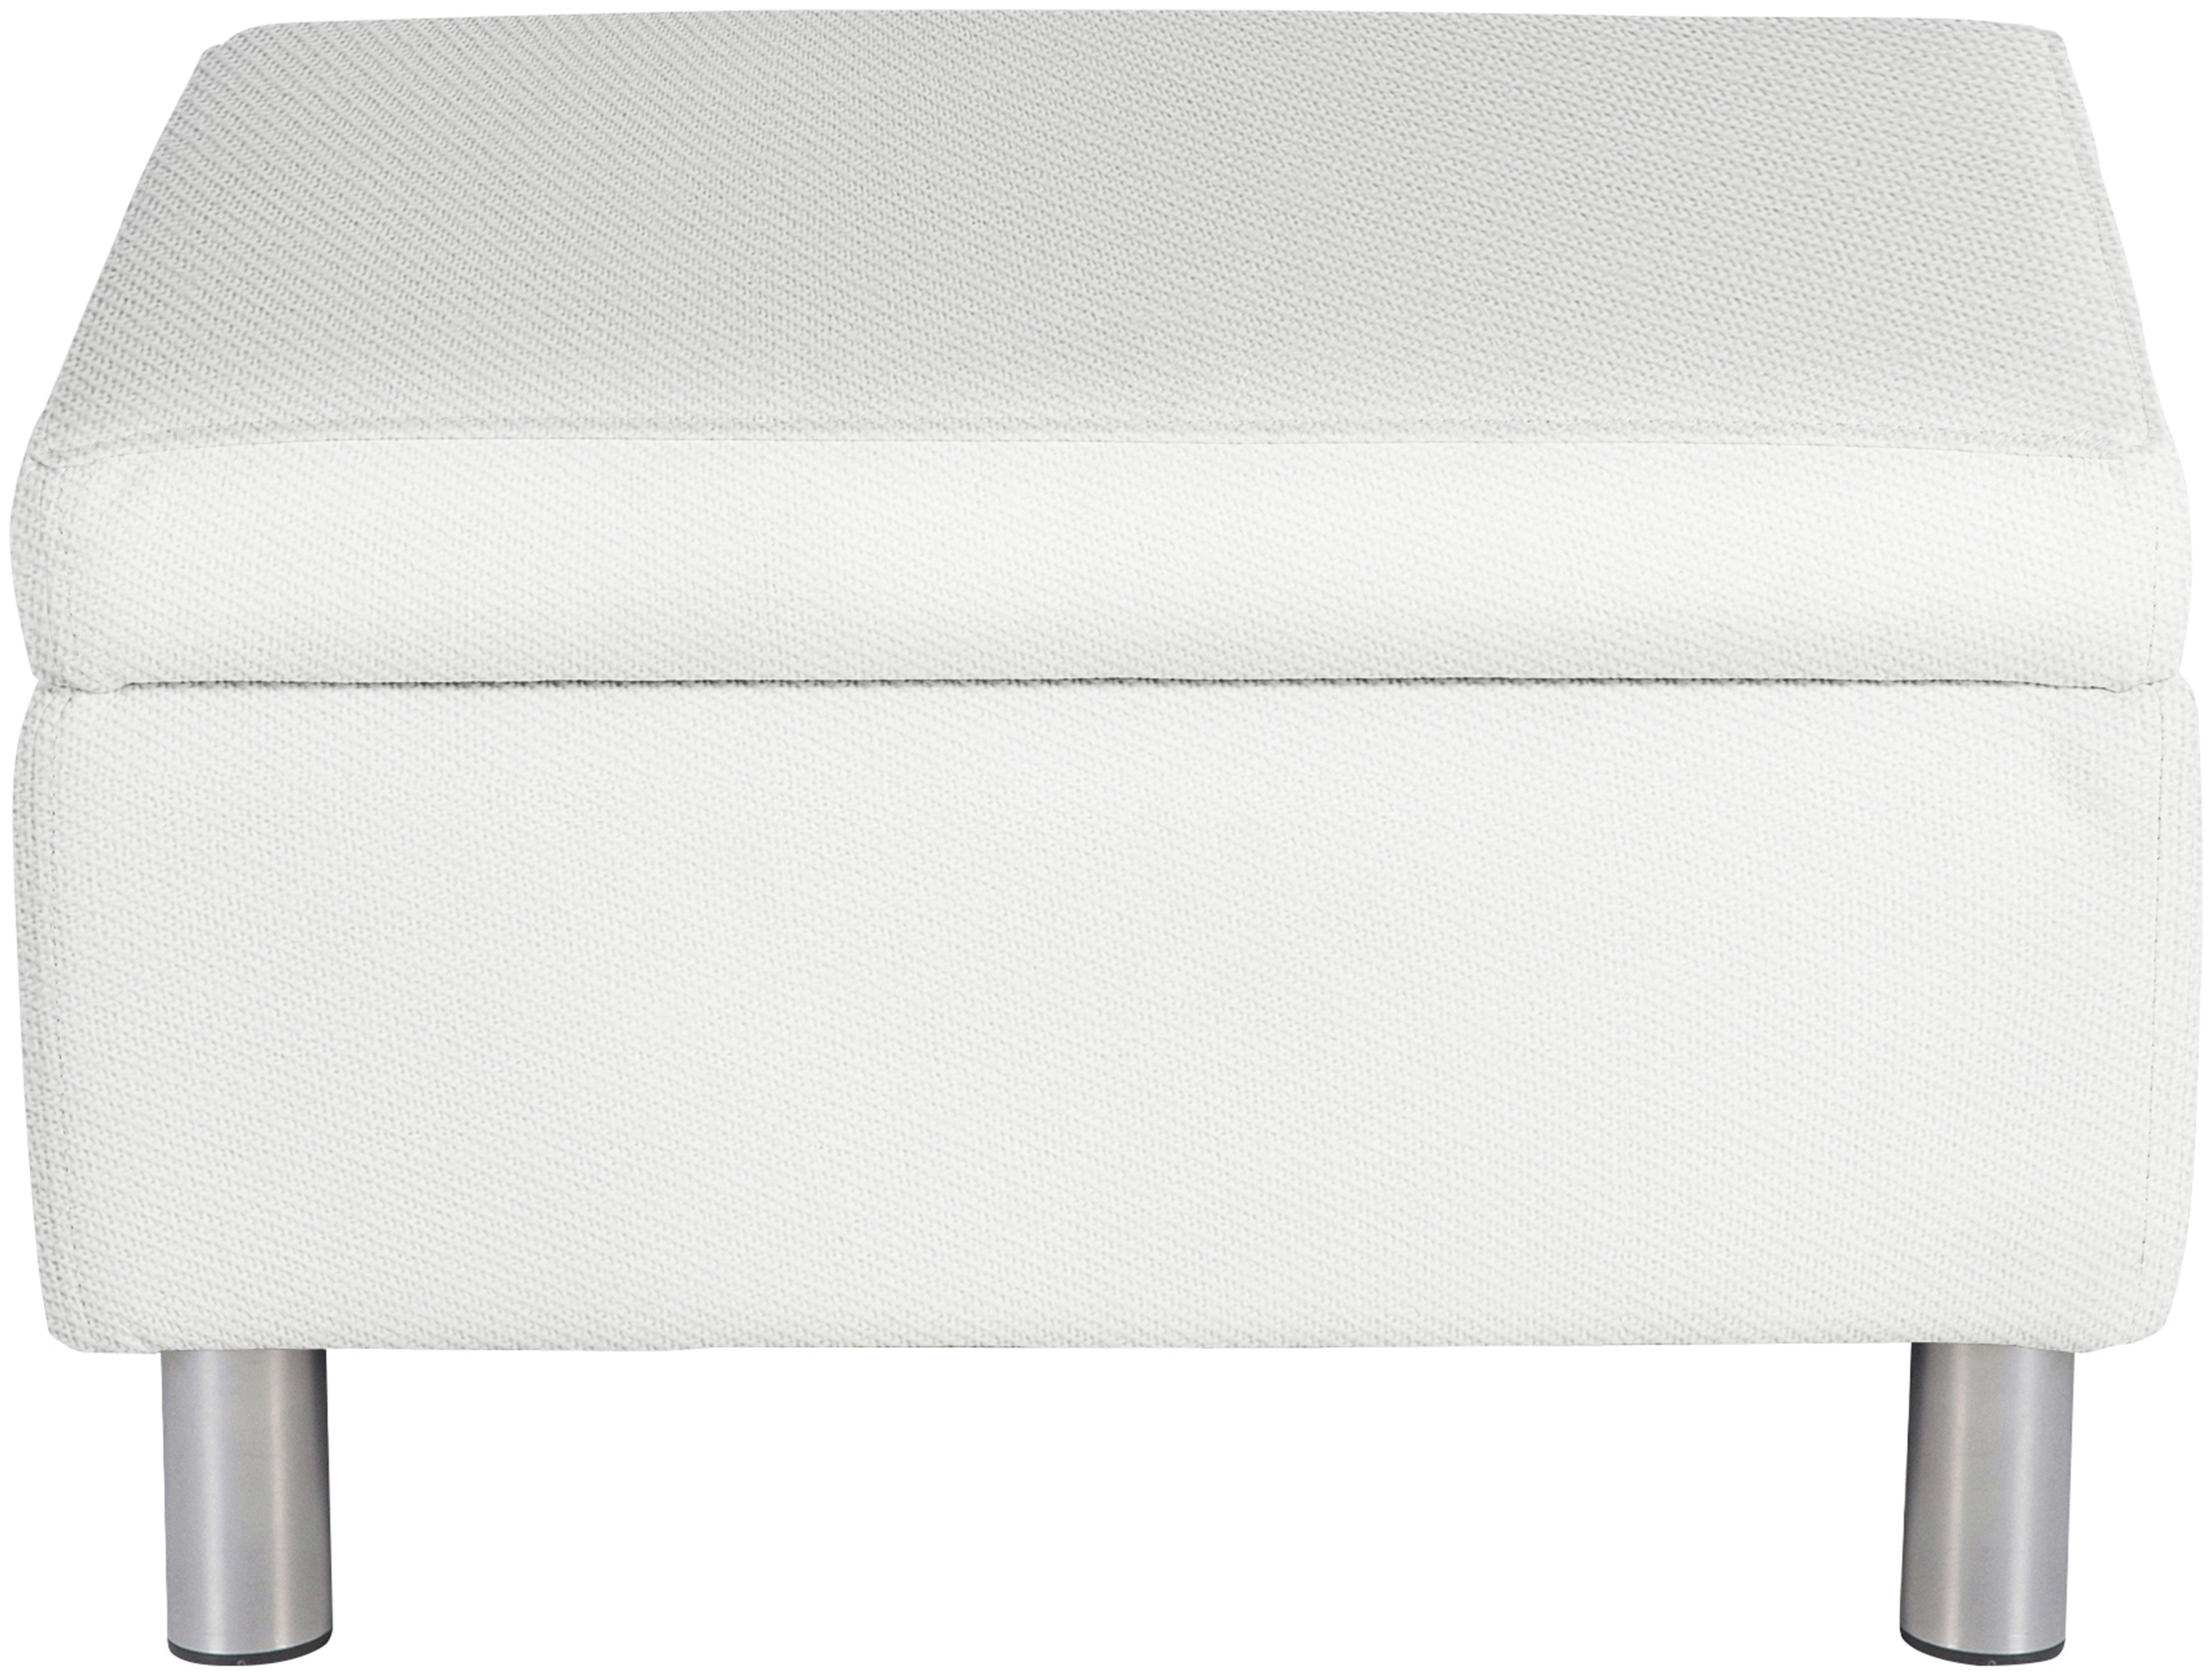 ColourMatch - Moda - Fabric Footstool - Super White